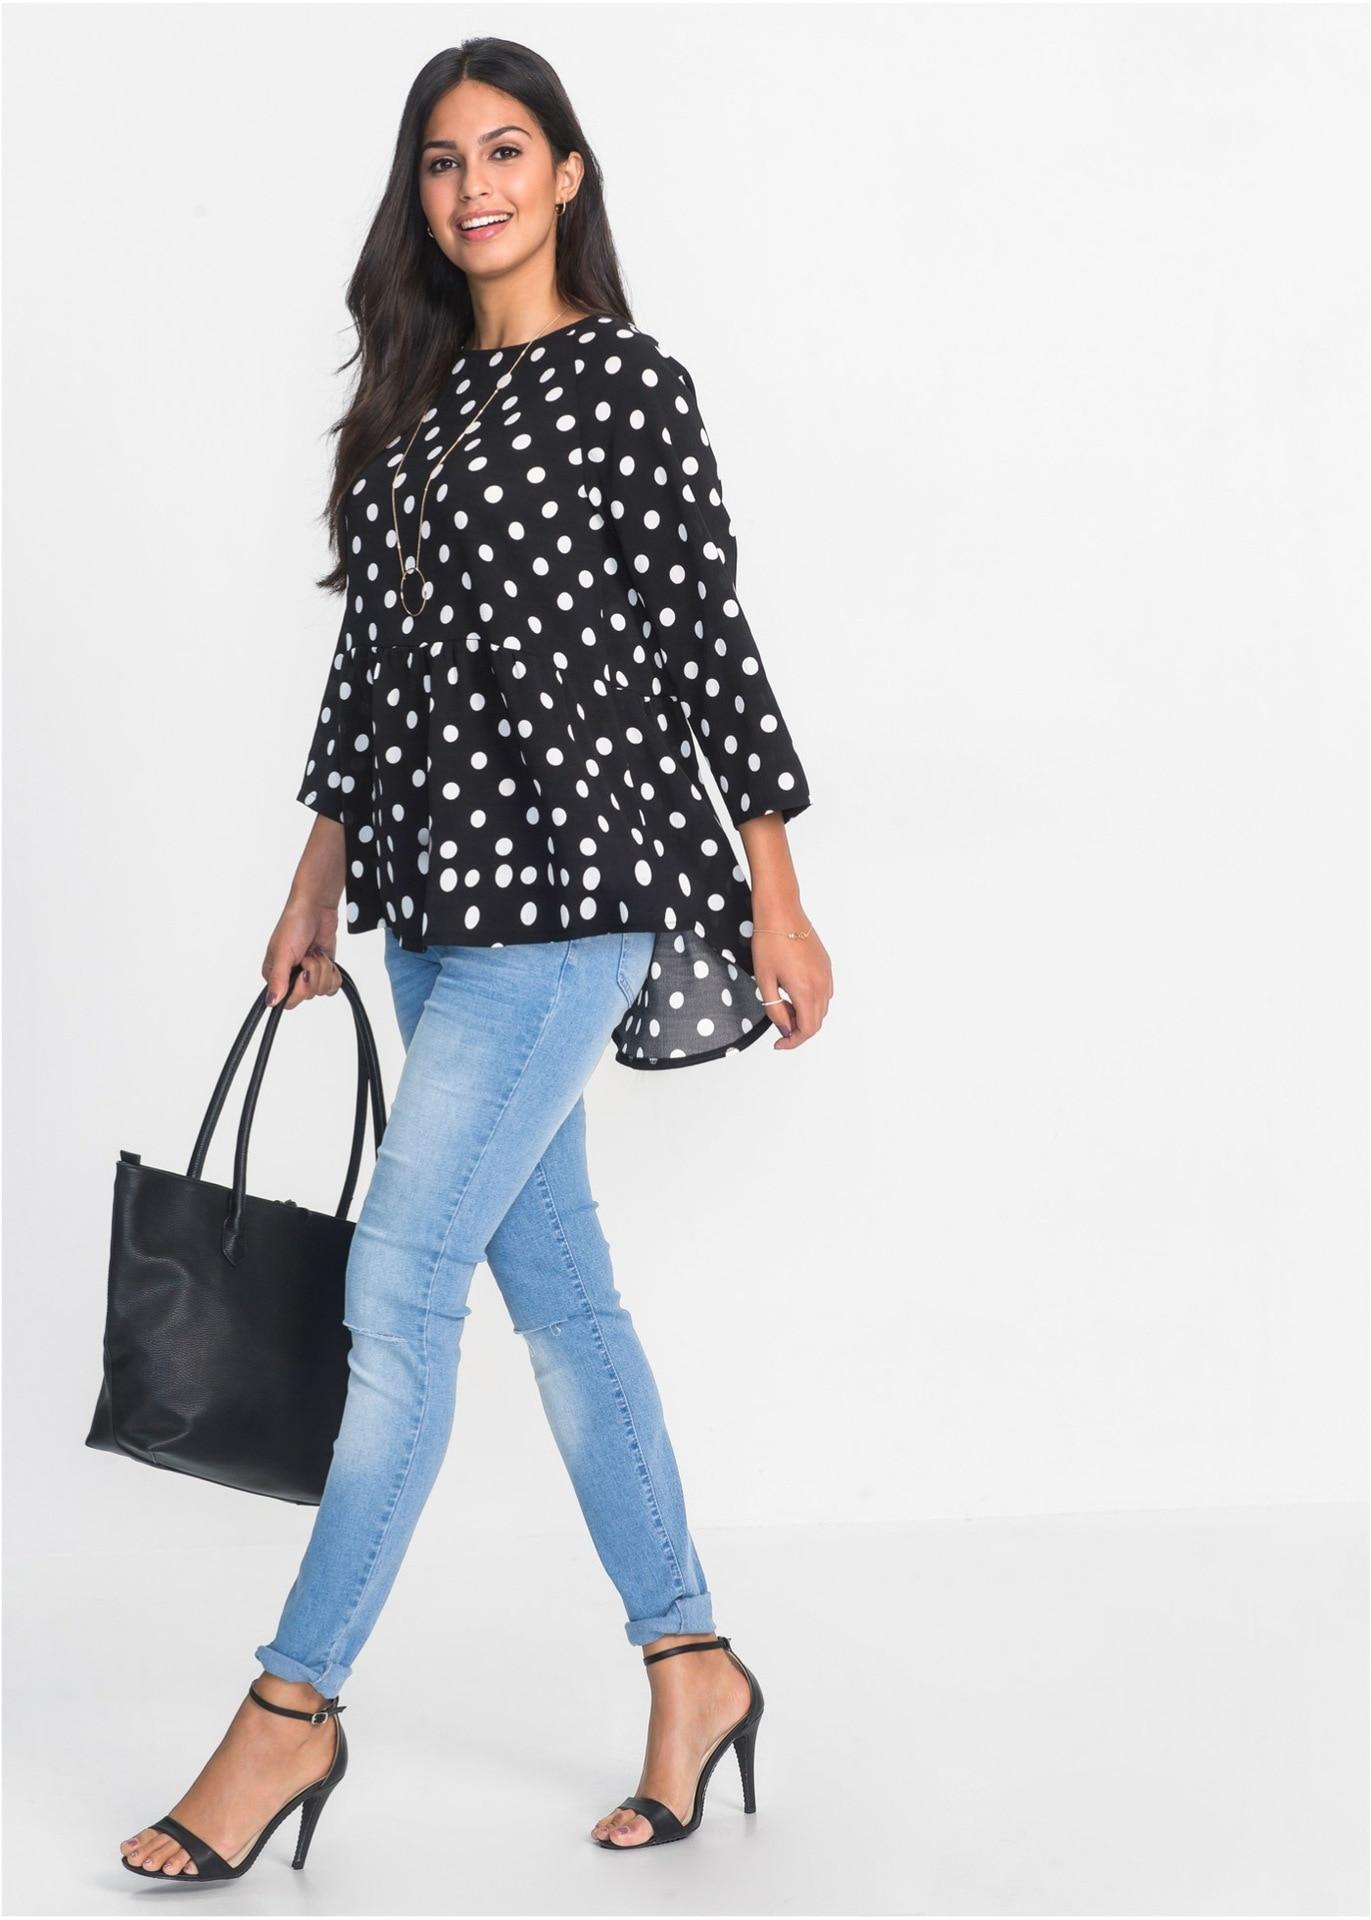 9cf70772132 Black White Polka Dot Women Top Spring Autumn Long Sleeve Female Blouses  Shirt Loose Irregular Larger Women Top Tee Shirt Femme